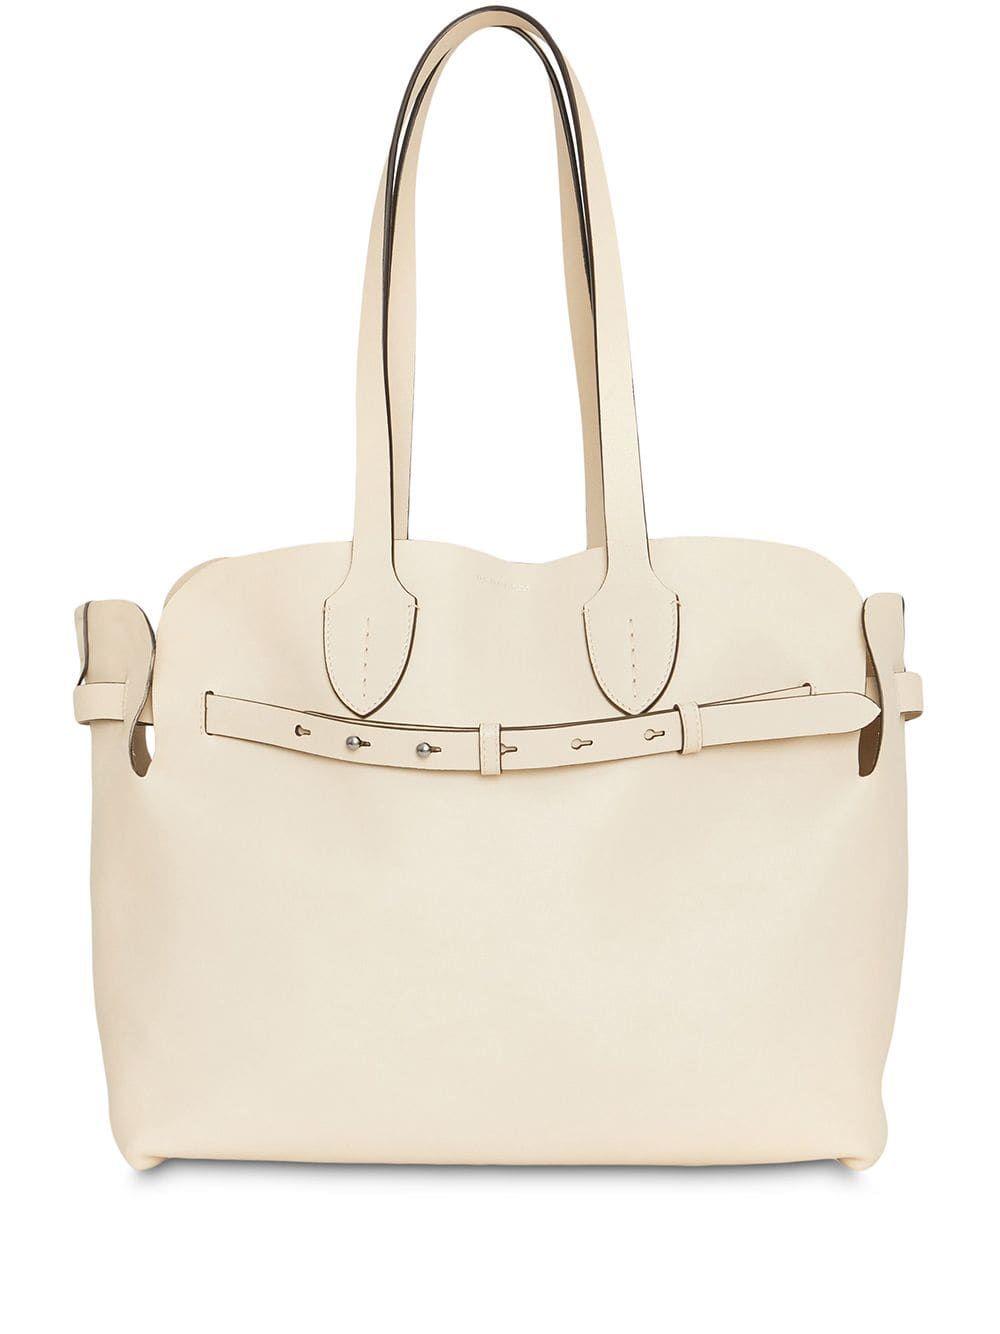 3781b1cfc Burberry The Medium Soft Leather Belt Bag - Farfetch Kate Spade, Top Luxury  Brands,